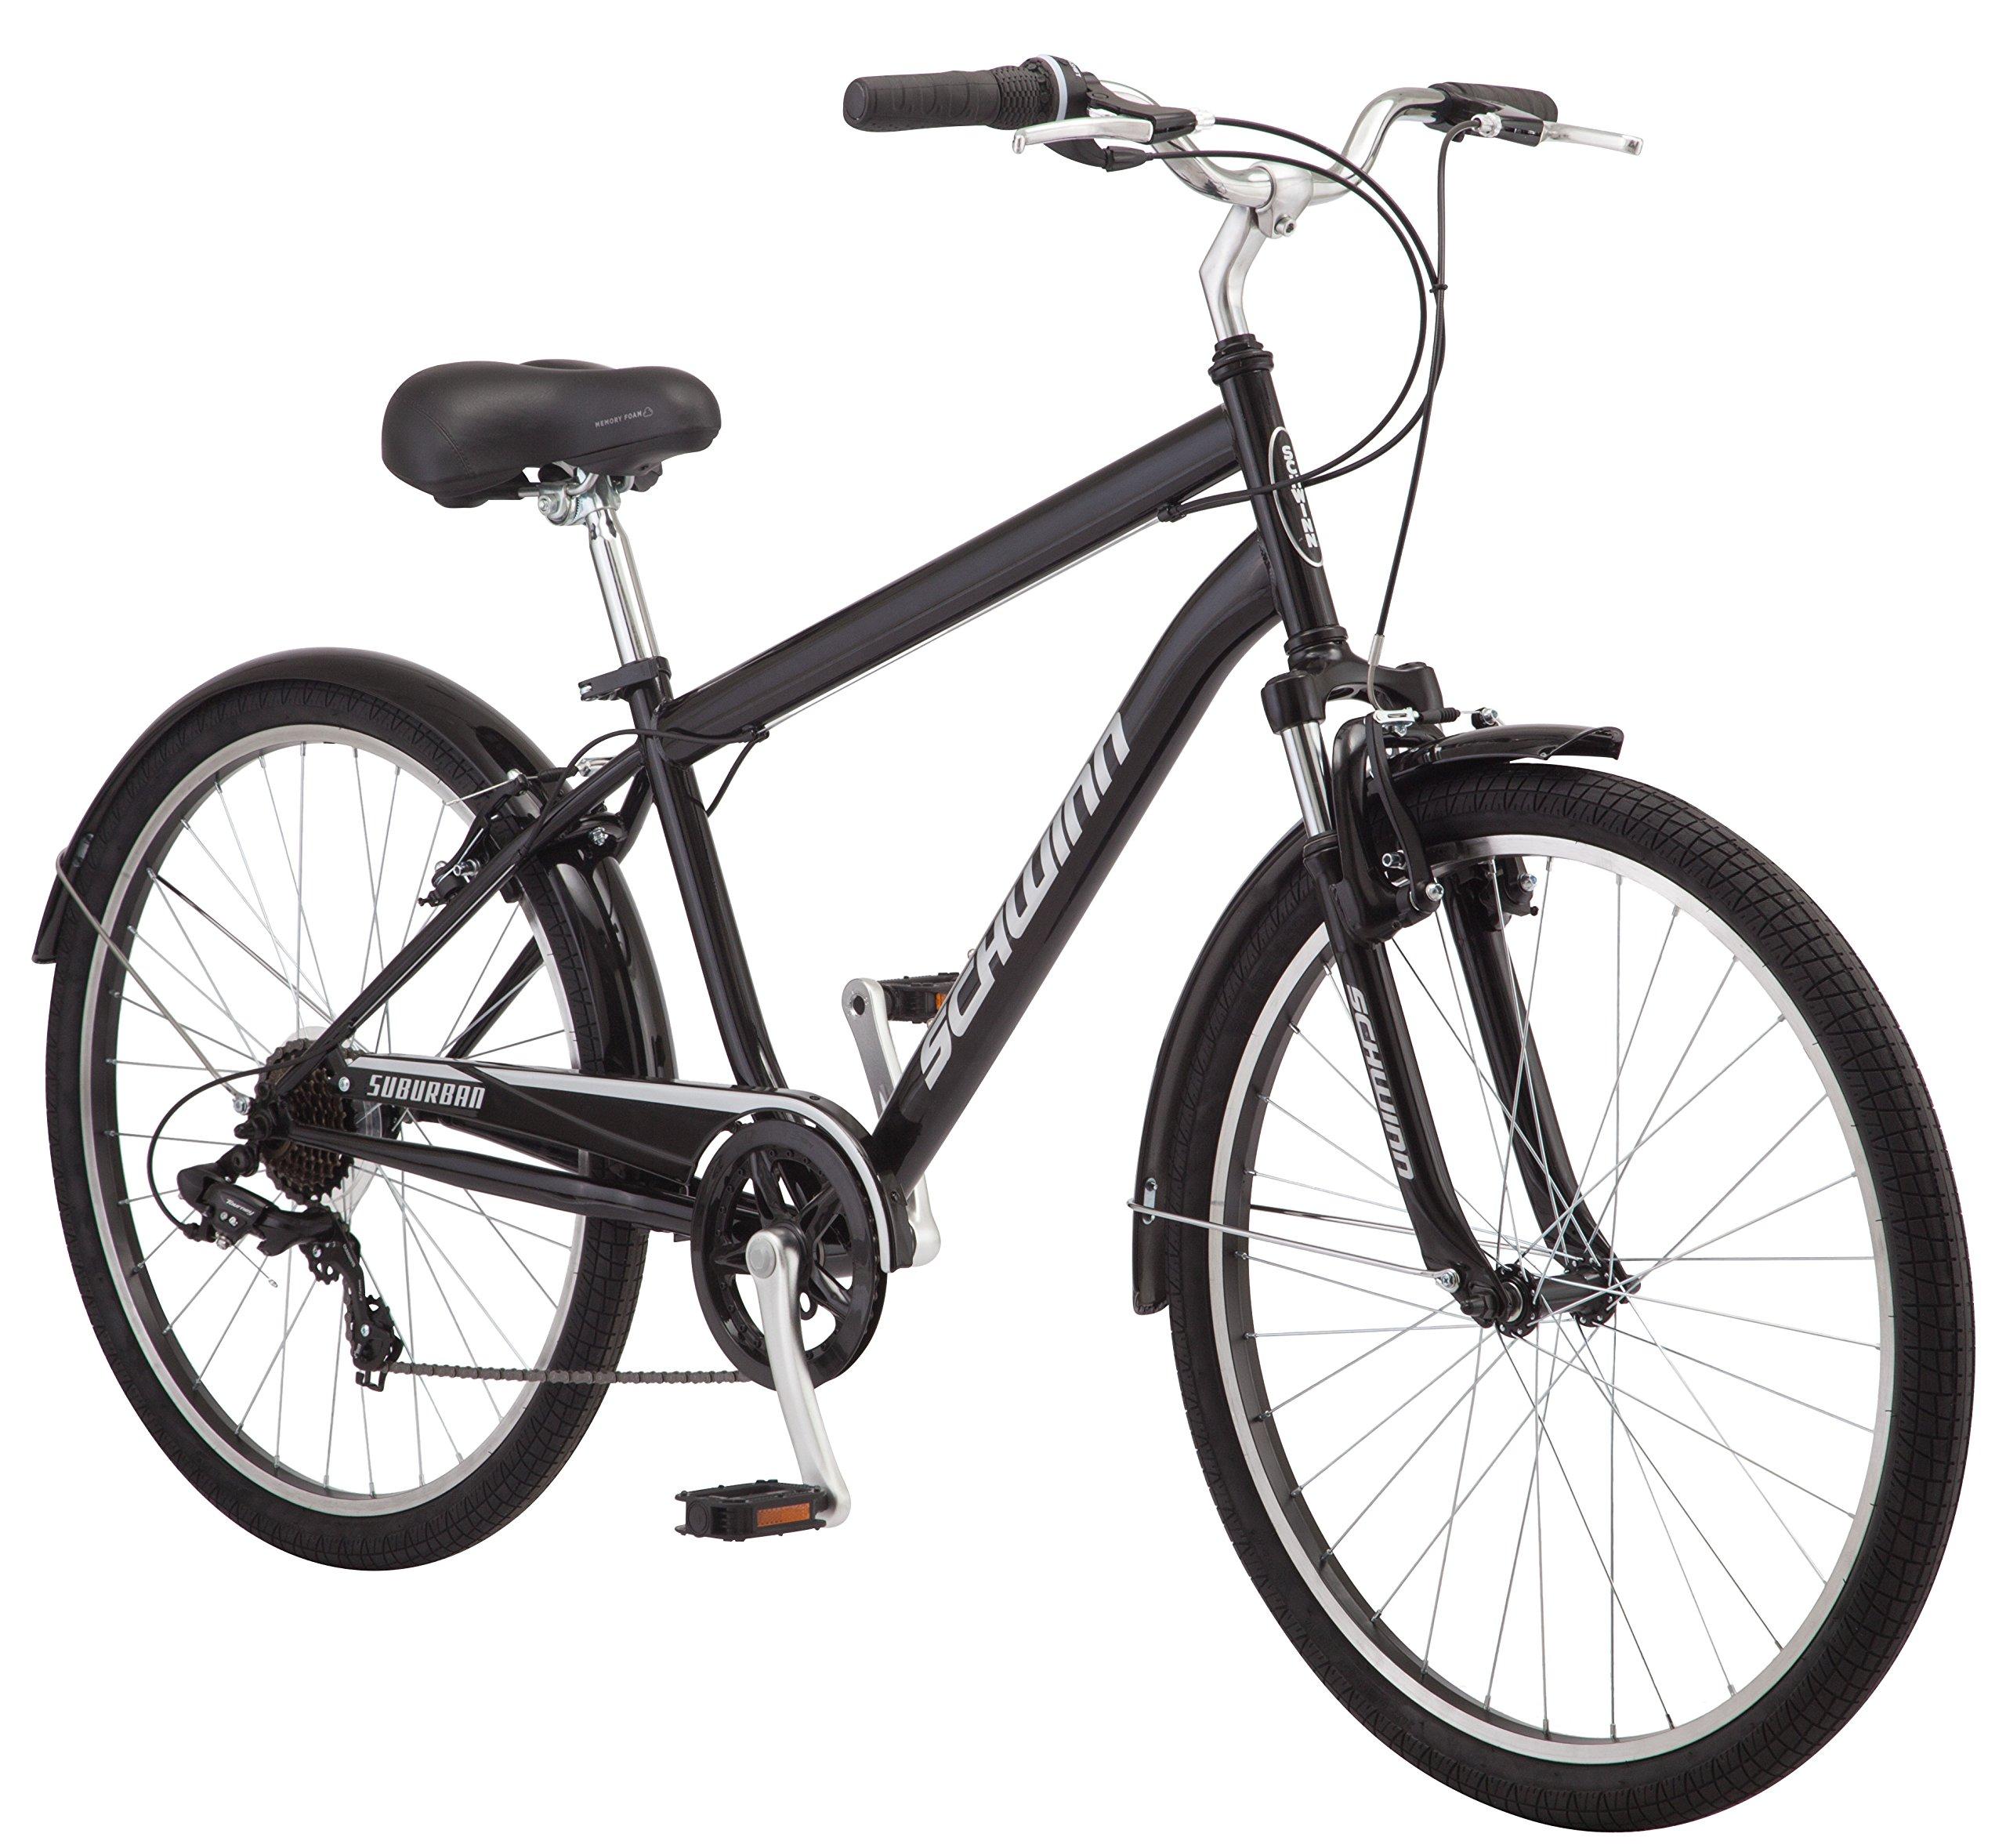 Schwinn Suburban Comfort Hybrid Bike, Featuring Step-Over Steel Frame and 7-Speed Drivetrain with 26-Inch Wheels, Medium/18-Inch Frame, Black/White by Schwinn